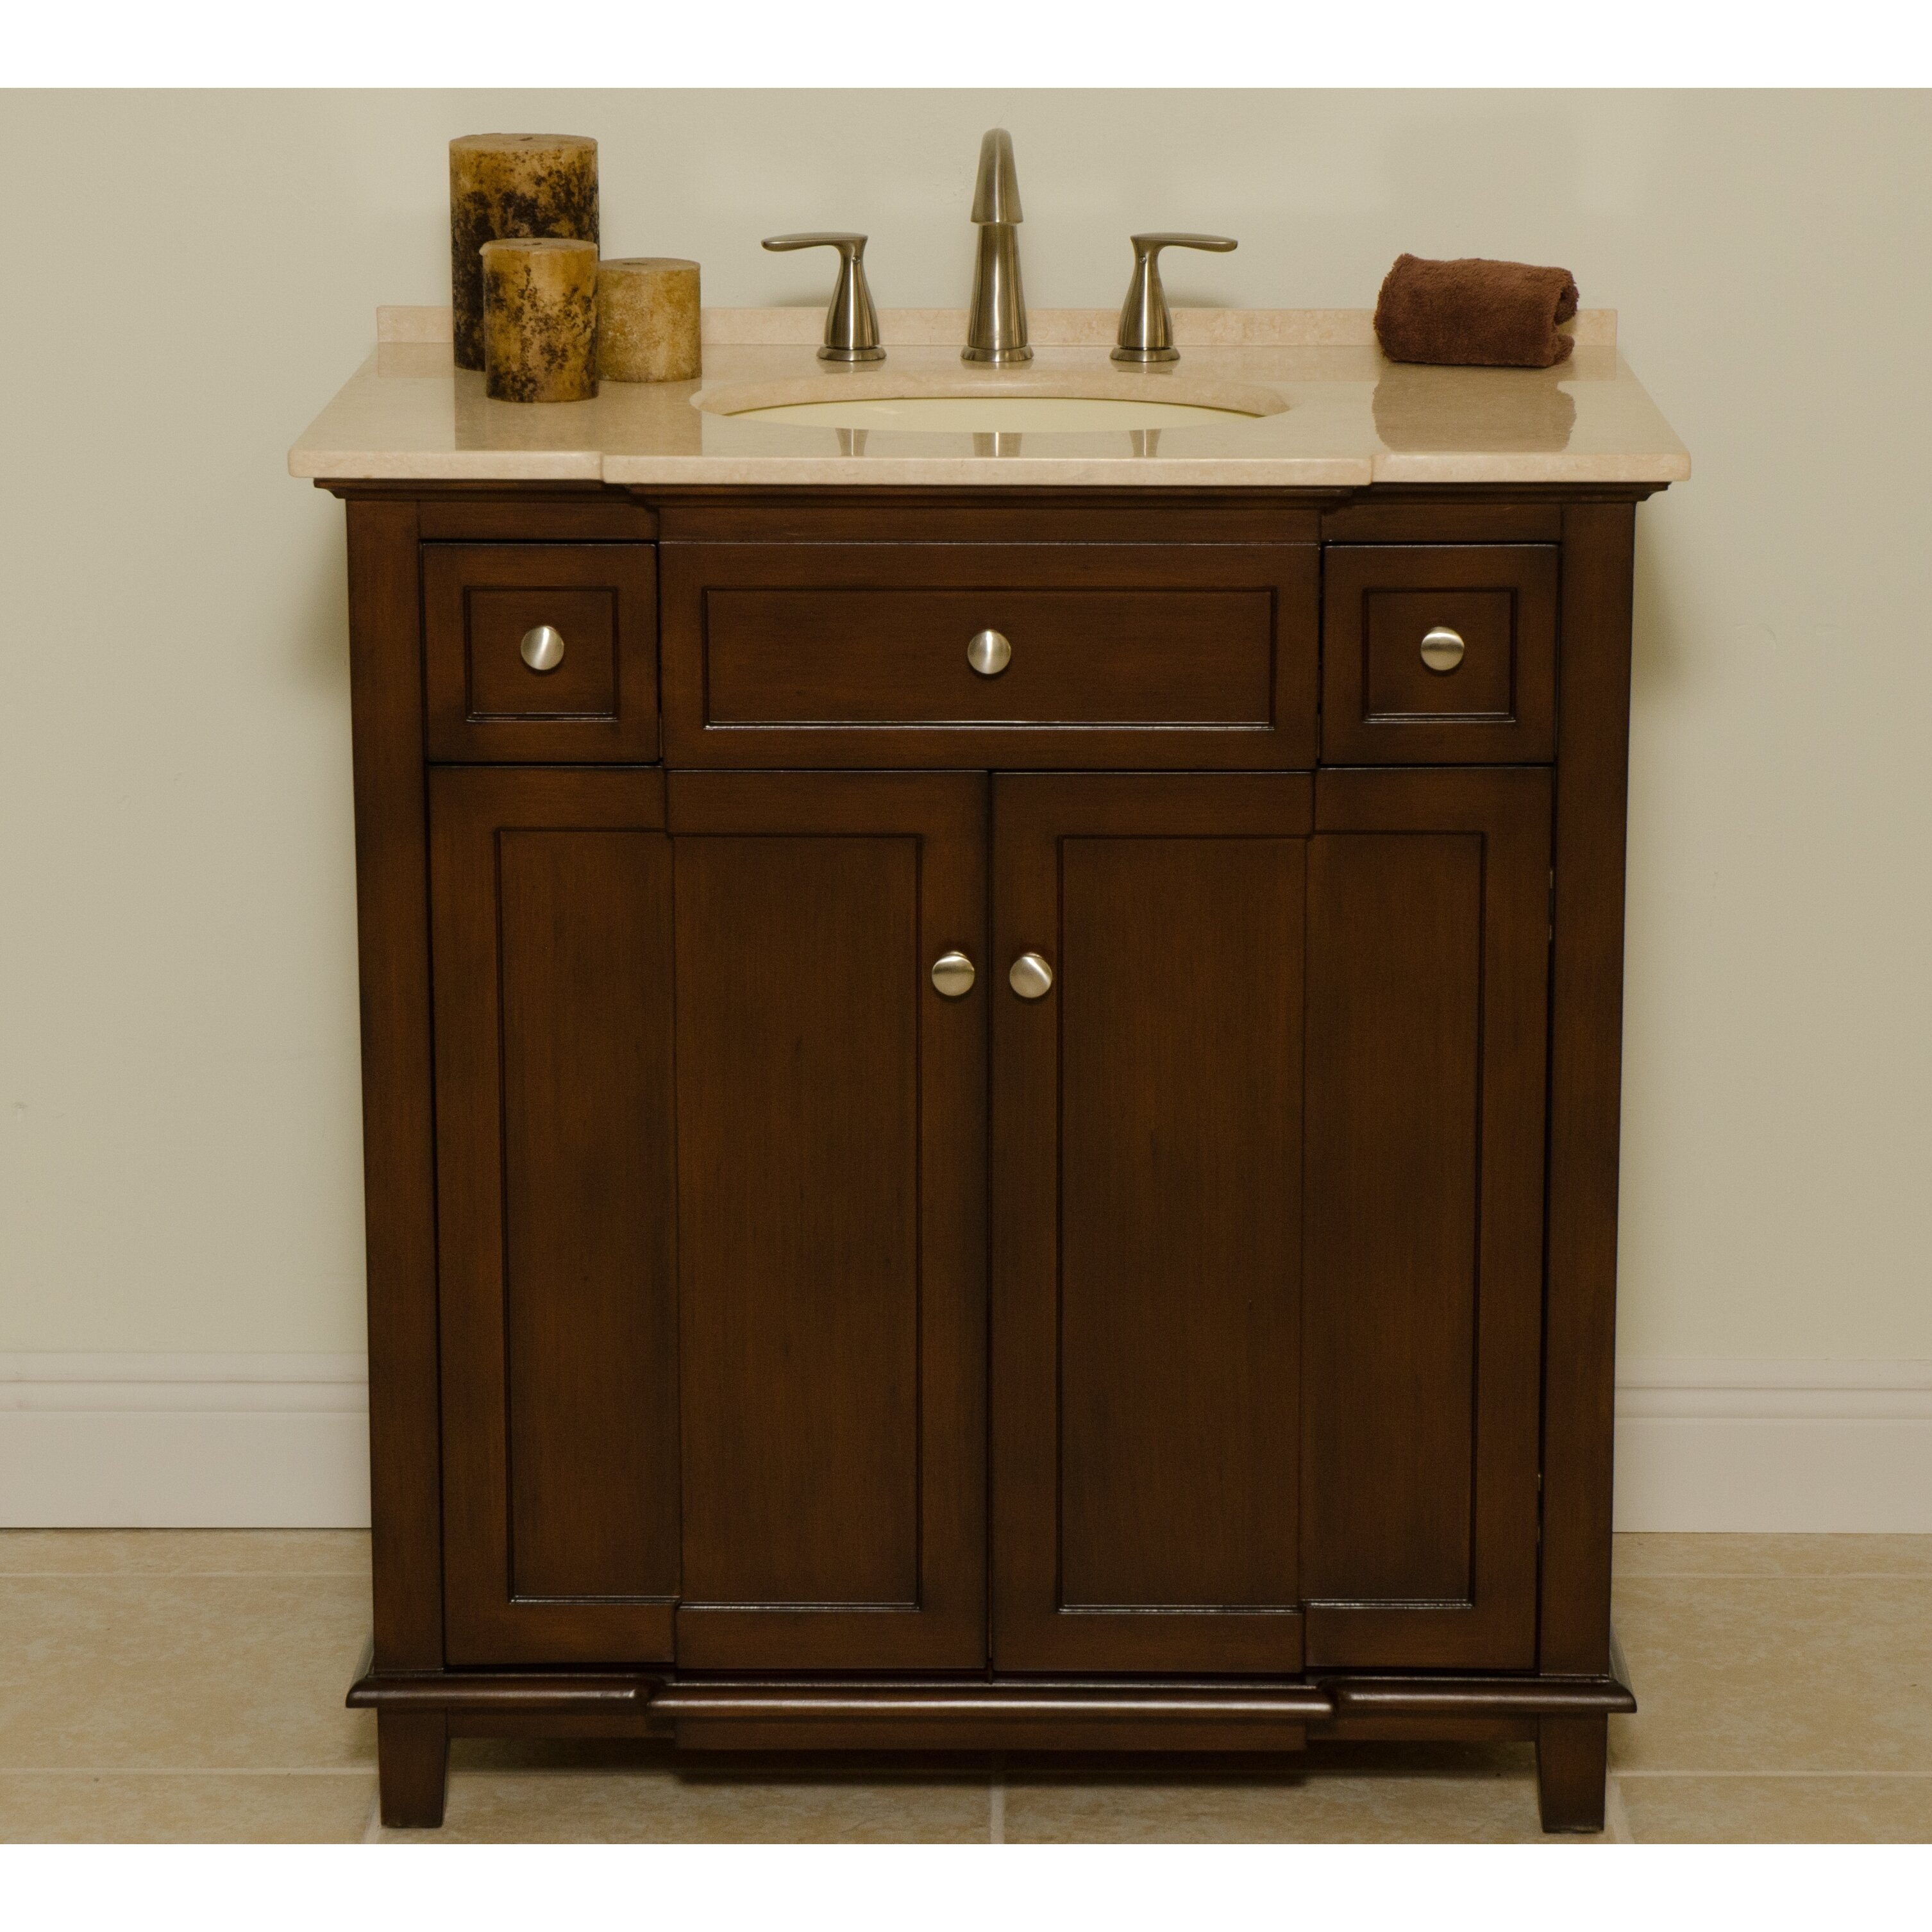 b i direct imports preston 34 single bathroom vanity set reviews wayfair